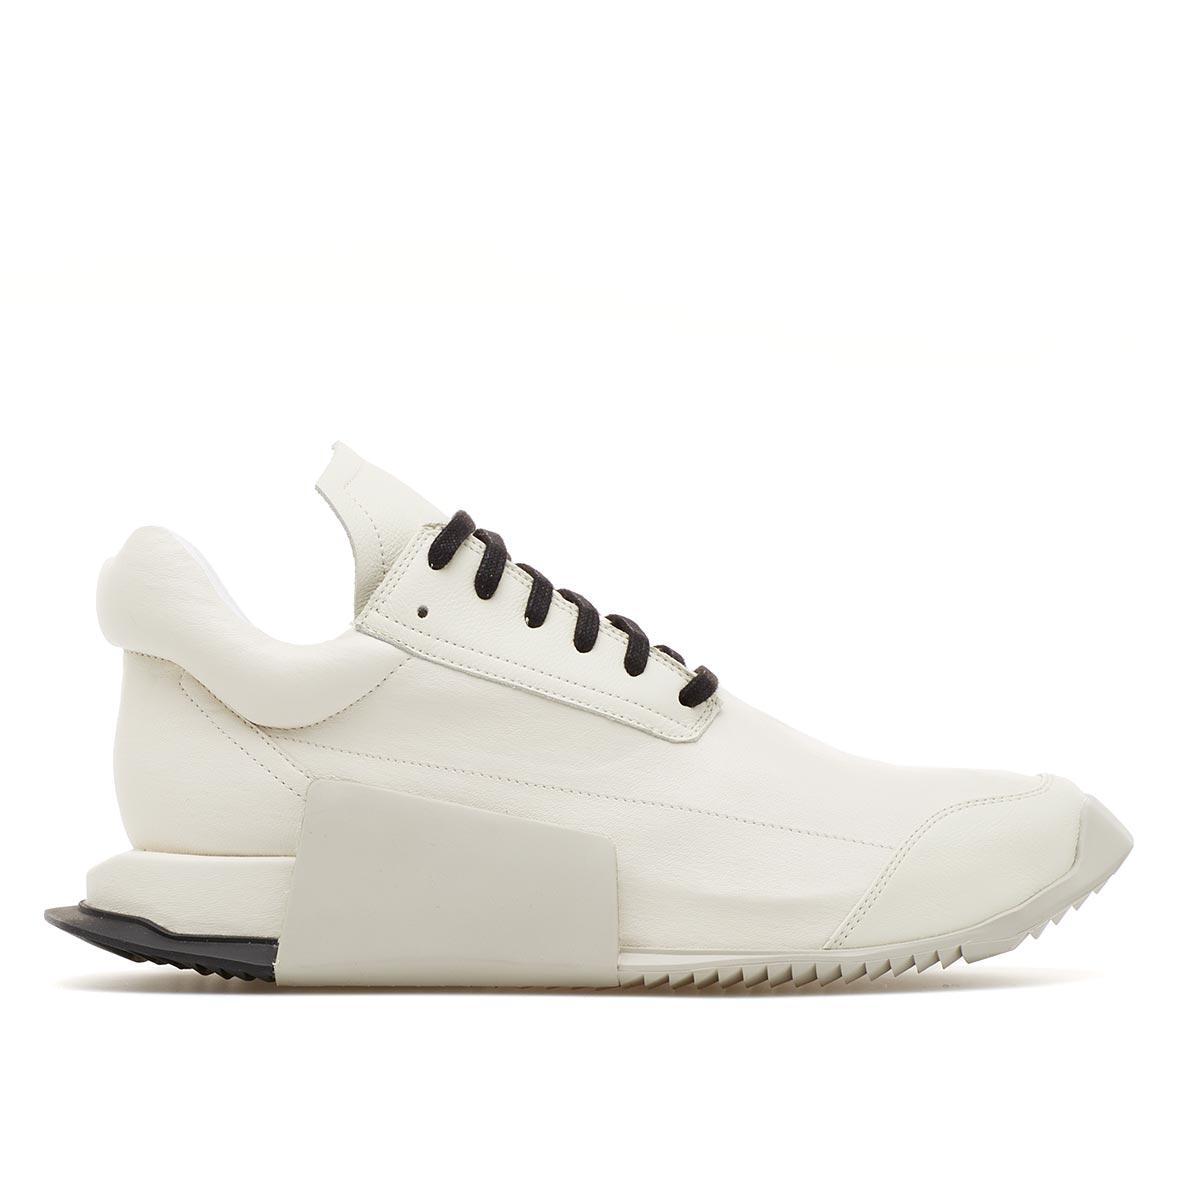 rick owens level runner sneaker in white for men lyst. Black Bedroom Furniture Sets. Home Design Ideas